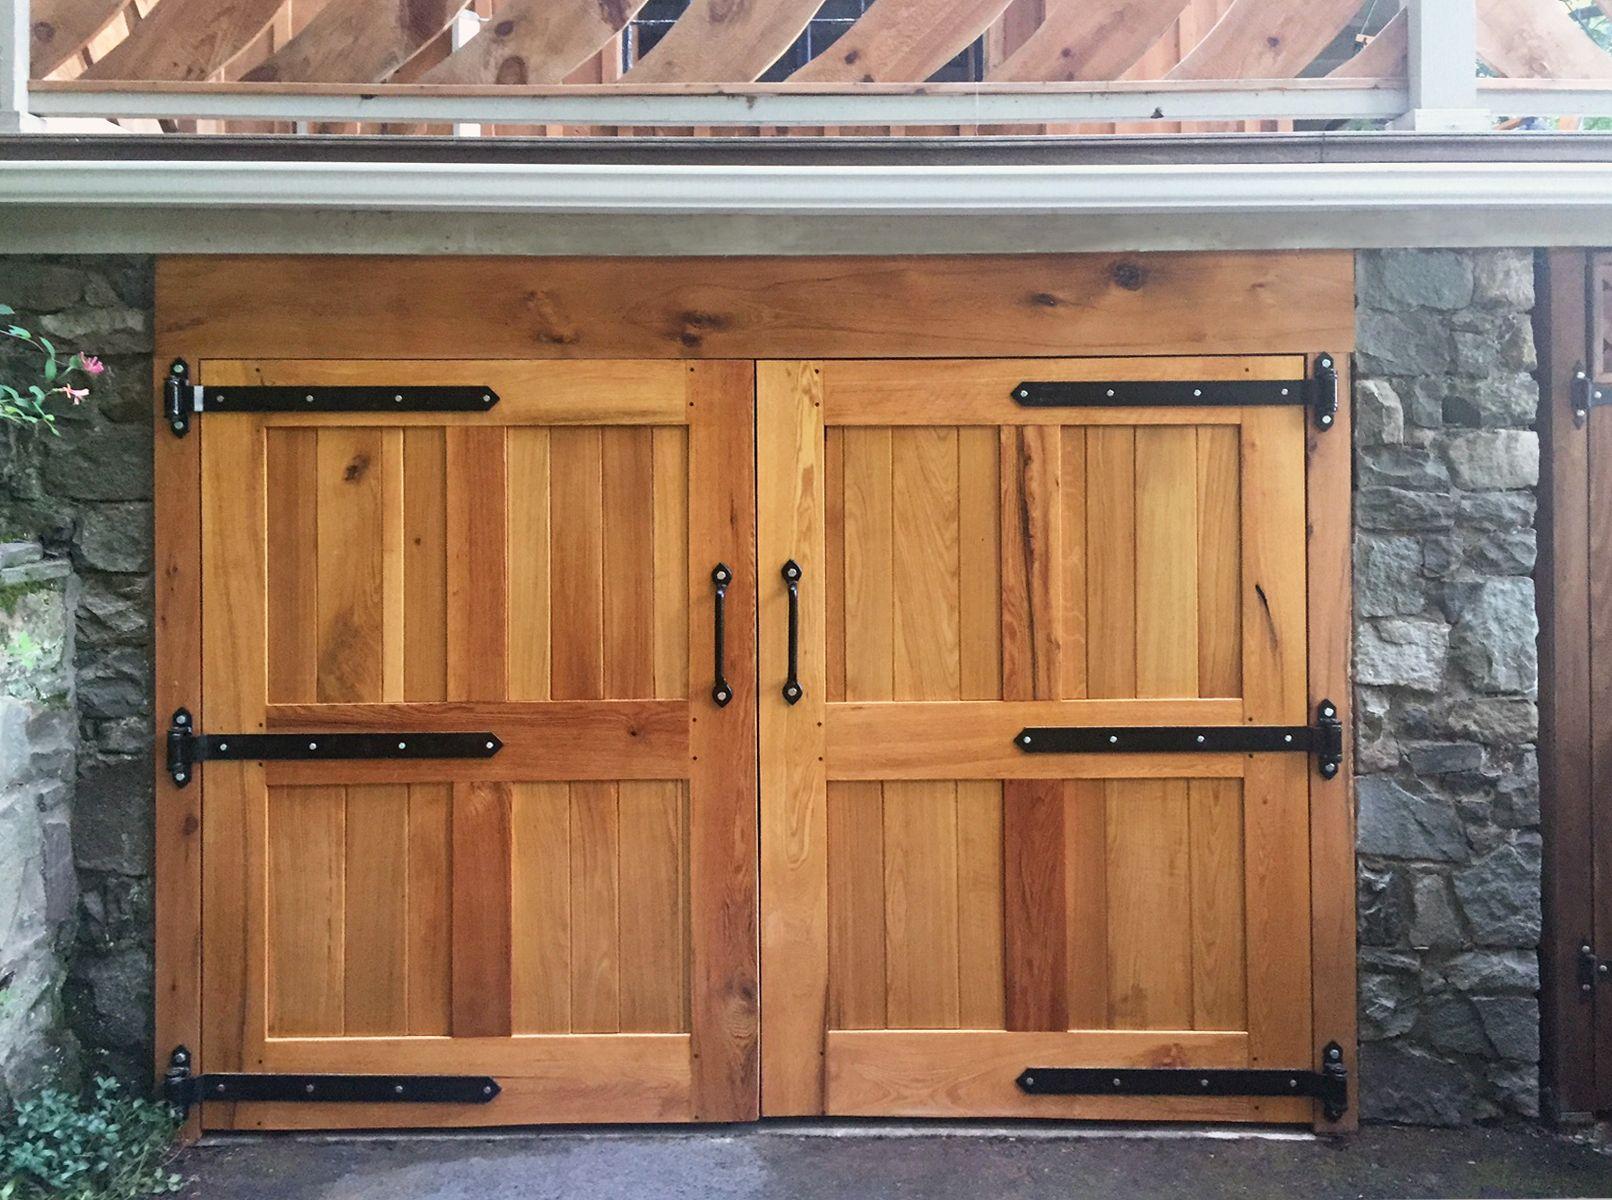 Rustic Barn Door Hardware On Swinging Wood Garage Or Cellar Doors